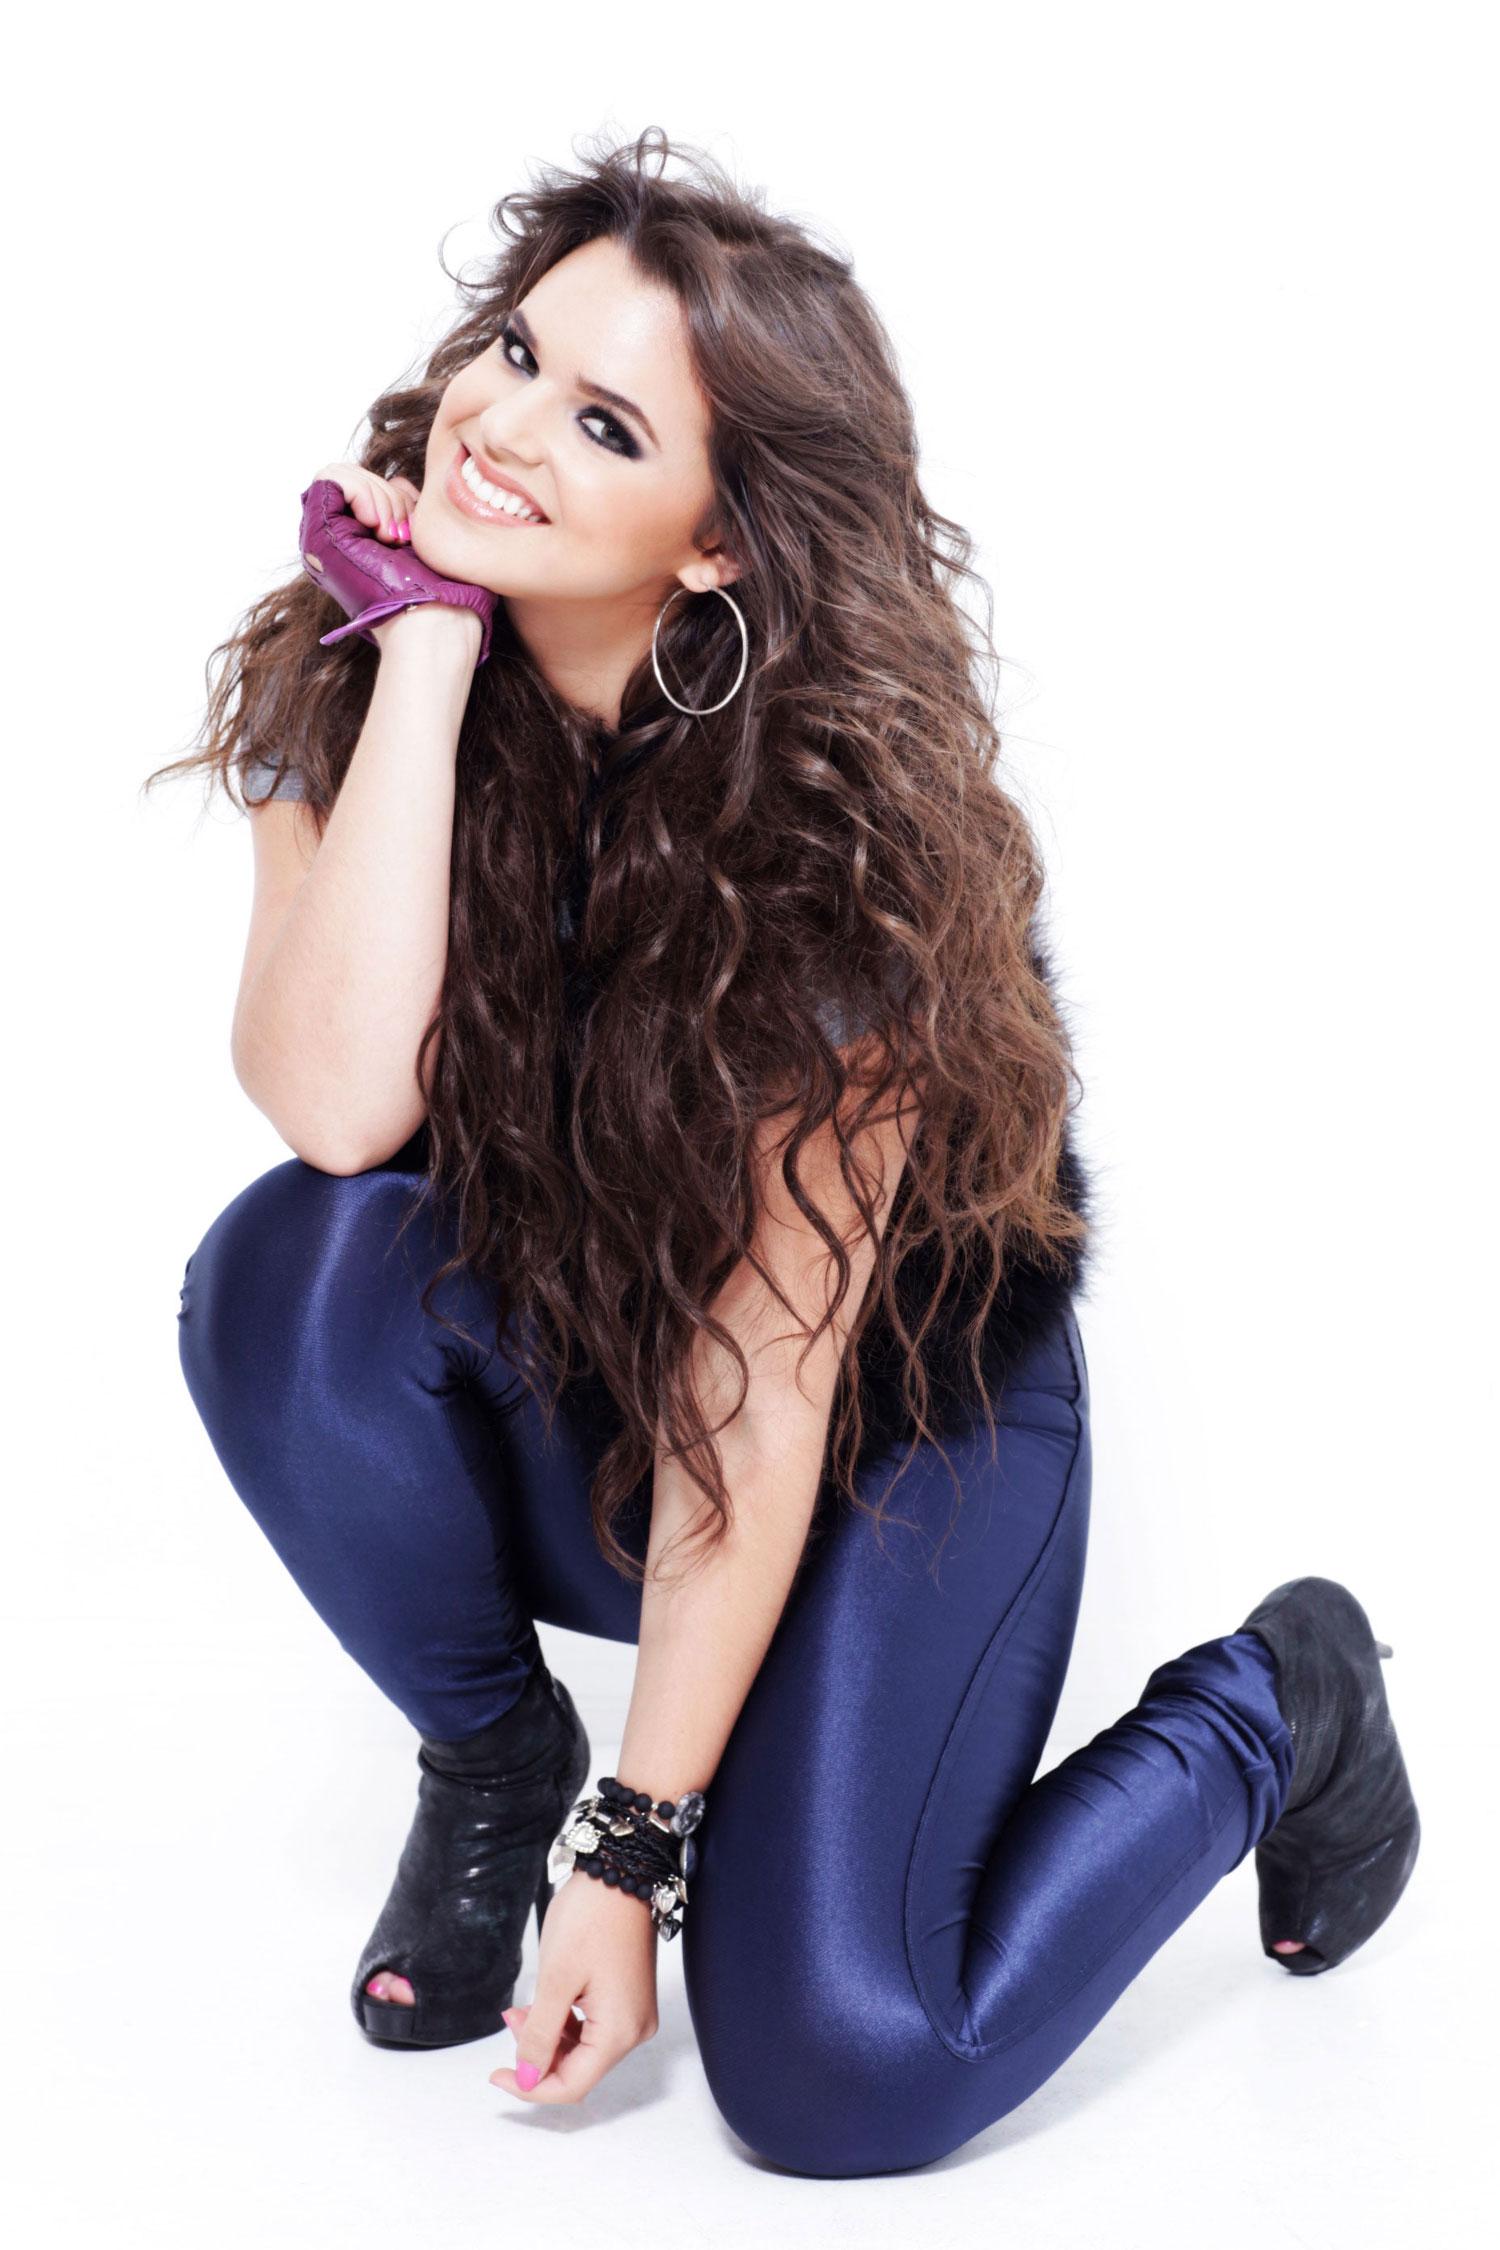 Isabella Castillo/ისაბელა კასტილიო 25c75232e49b8c84dbe1fcaaca97ab18